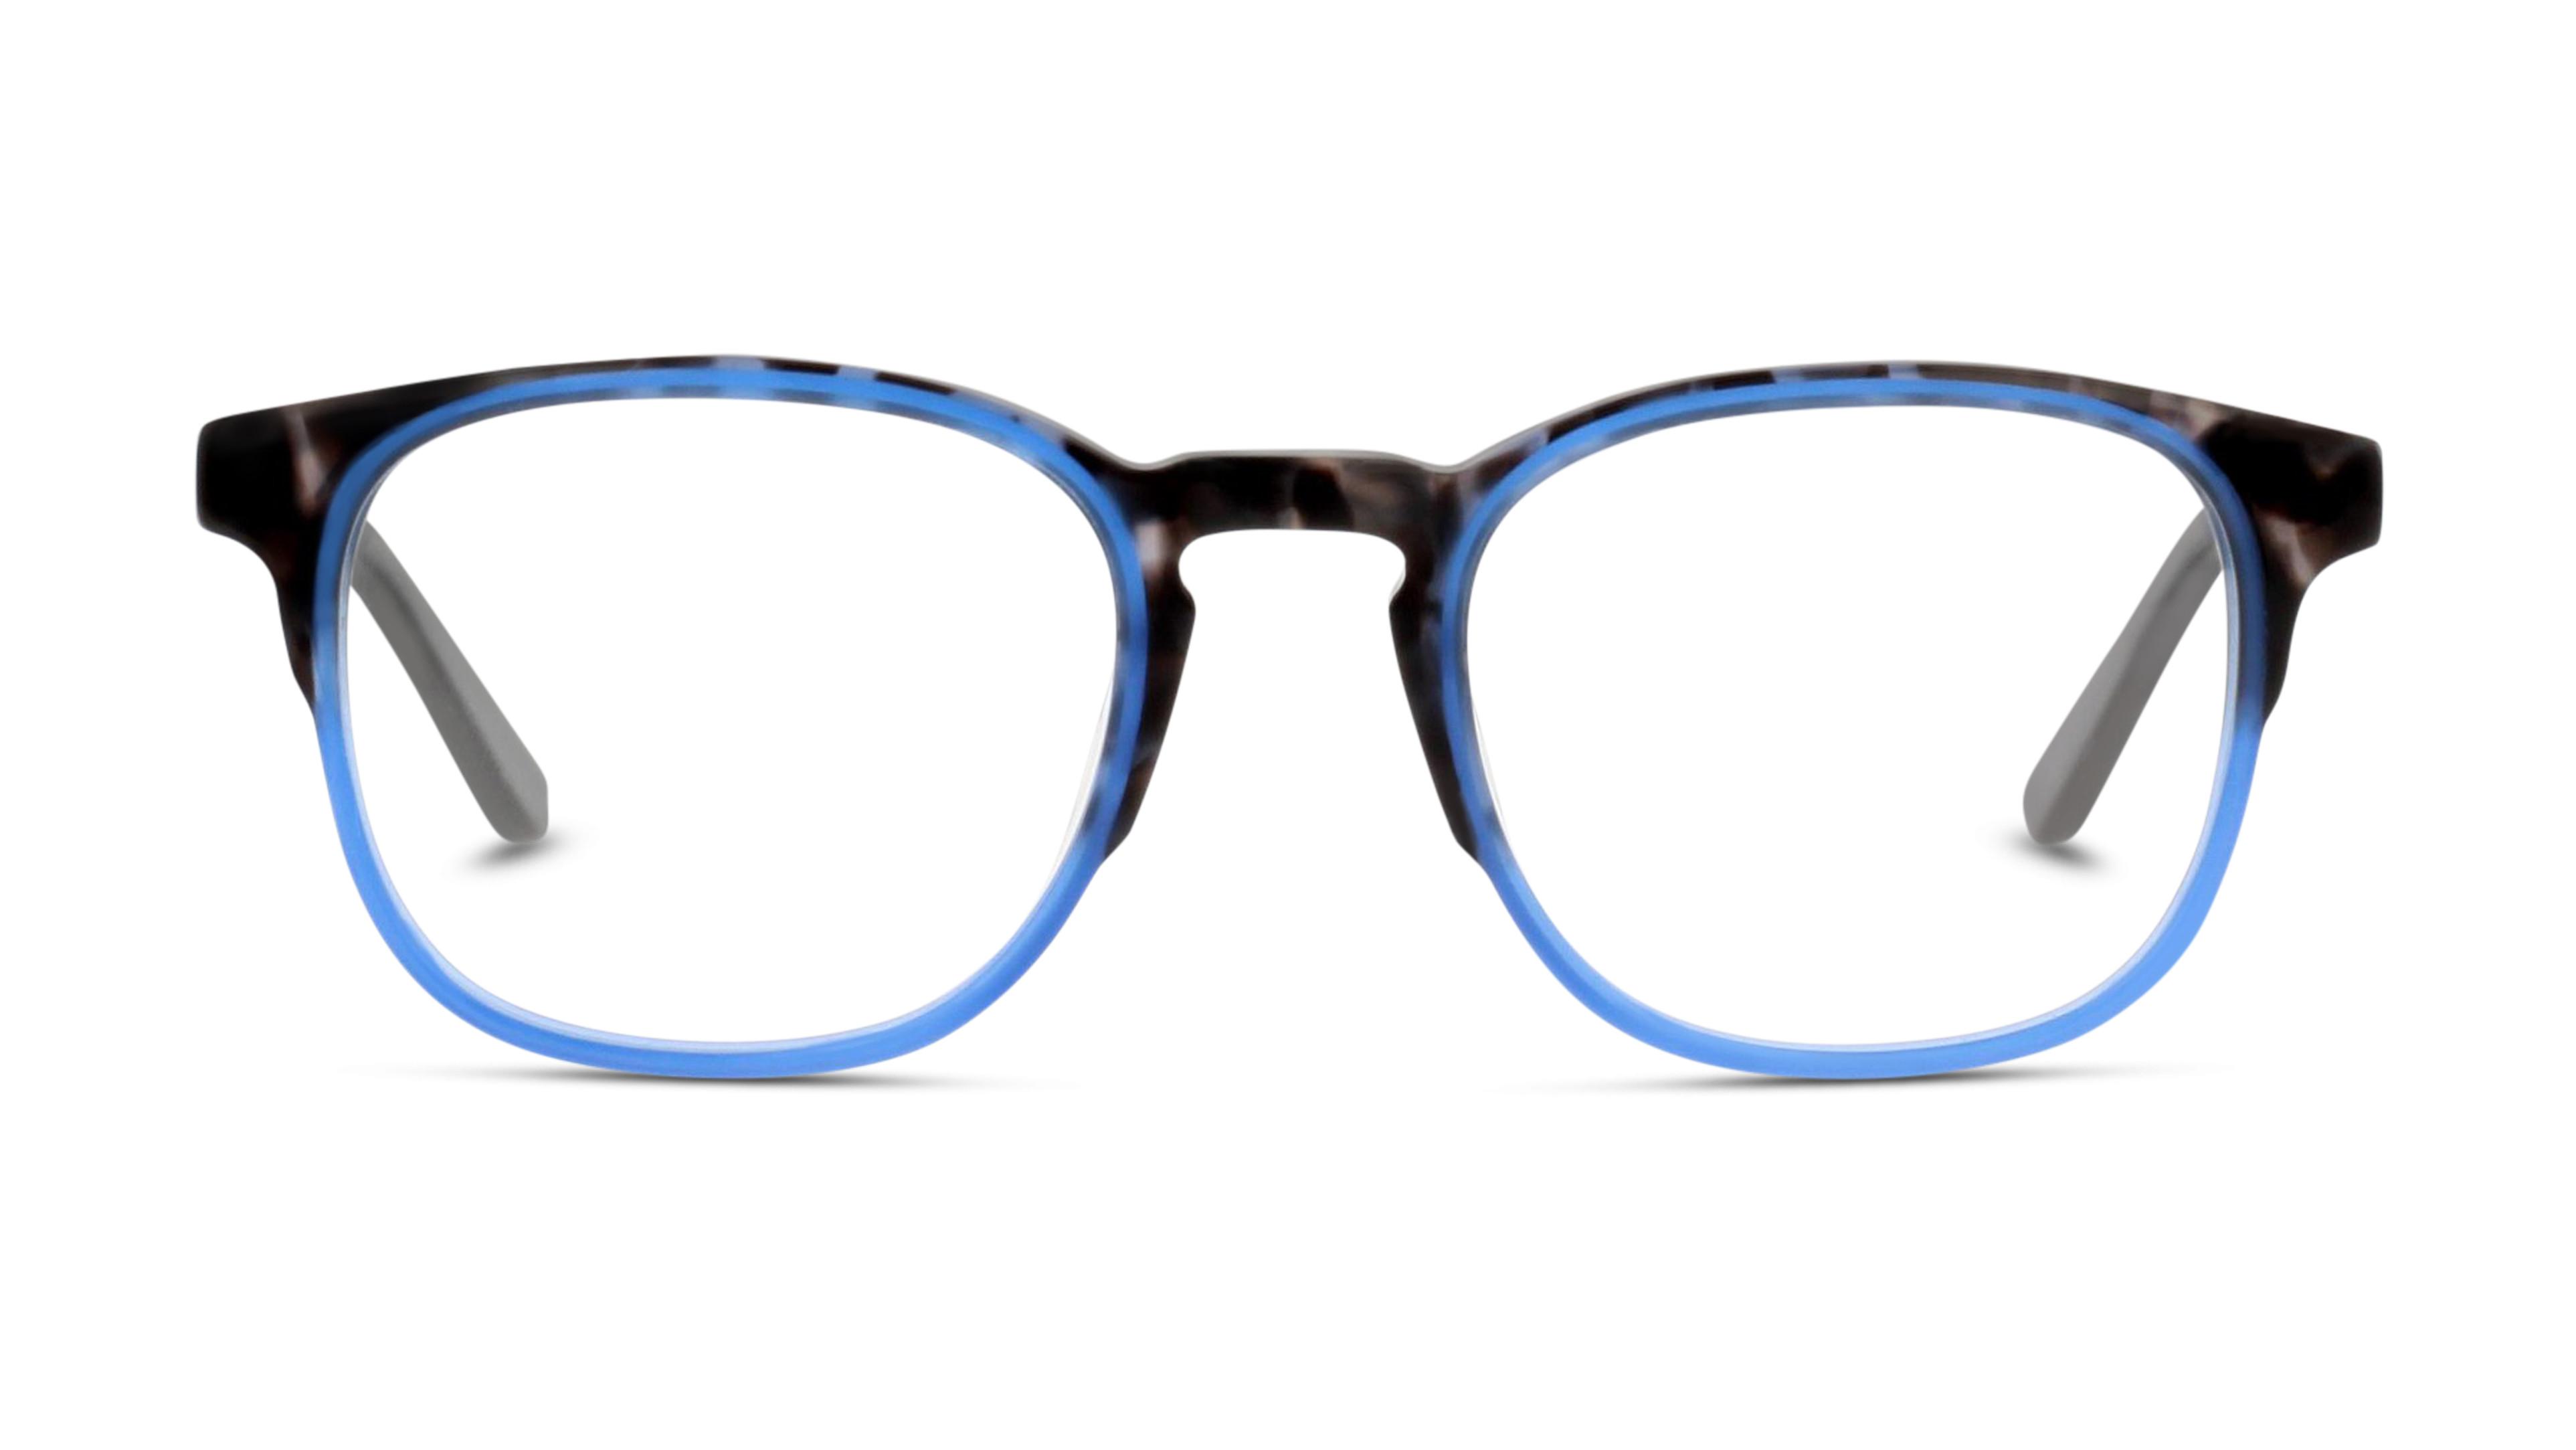 8719154621260-front-01-fuzion-fufm04-expressionism-black-navy-blue